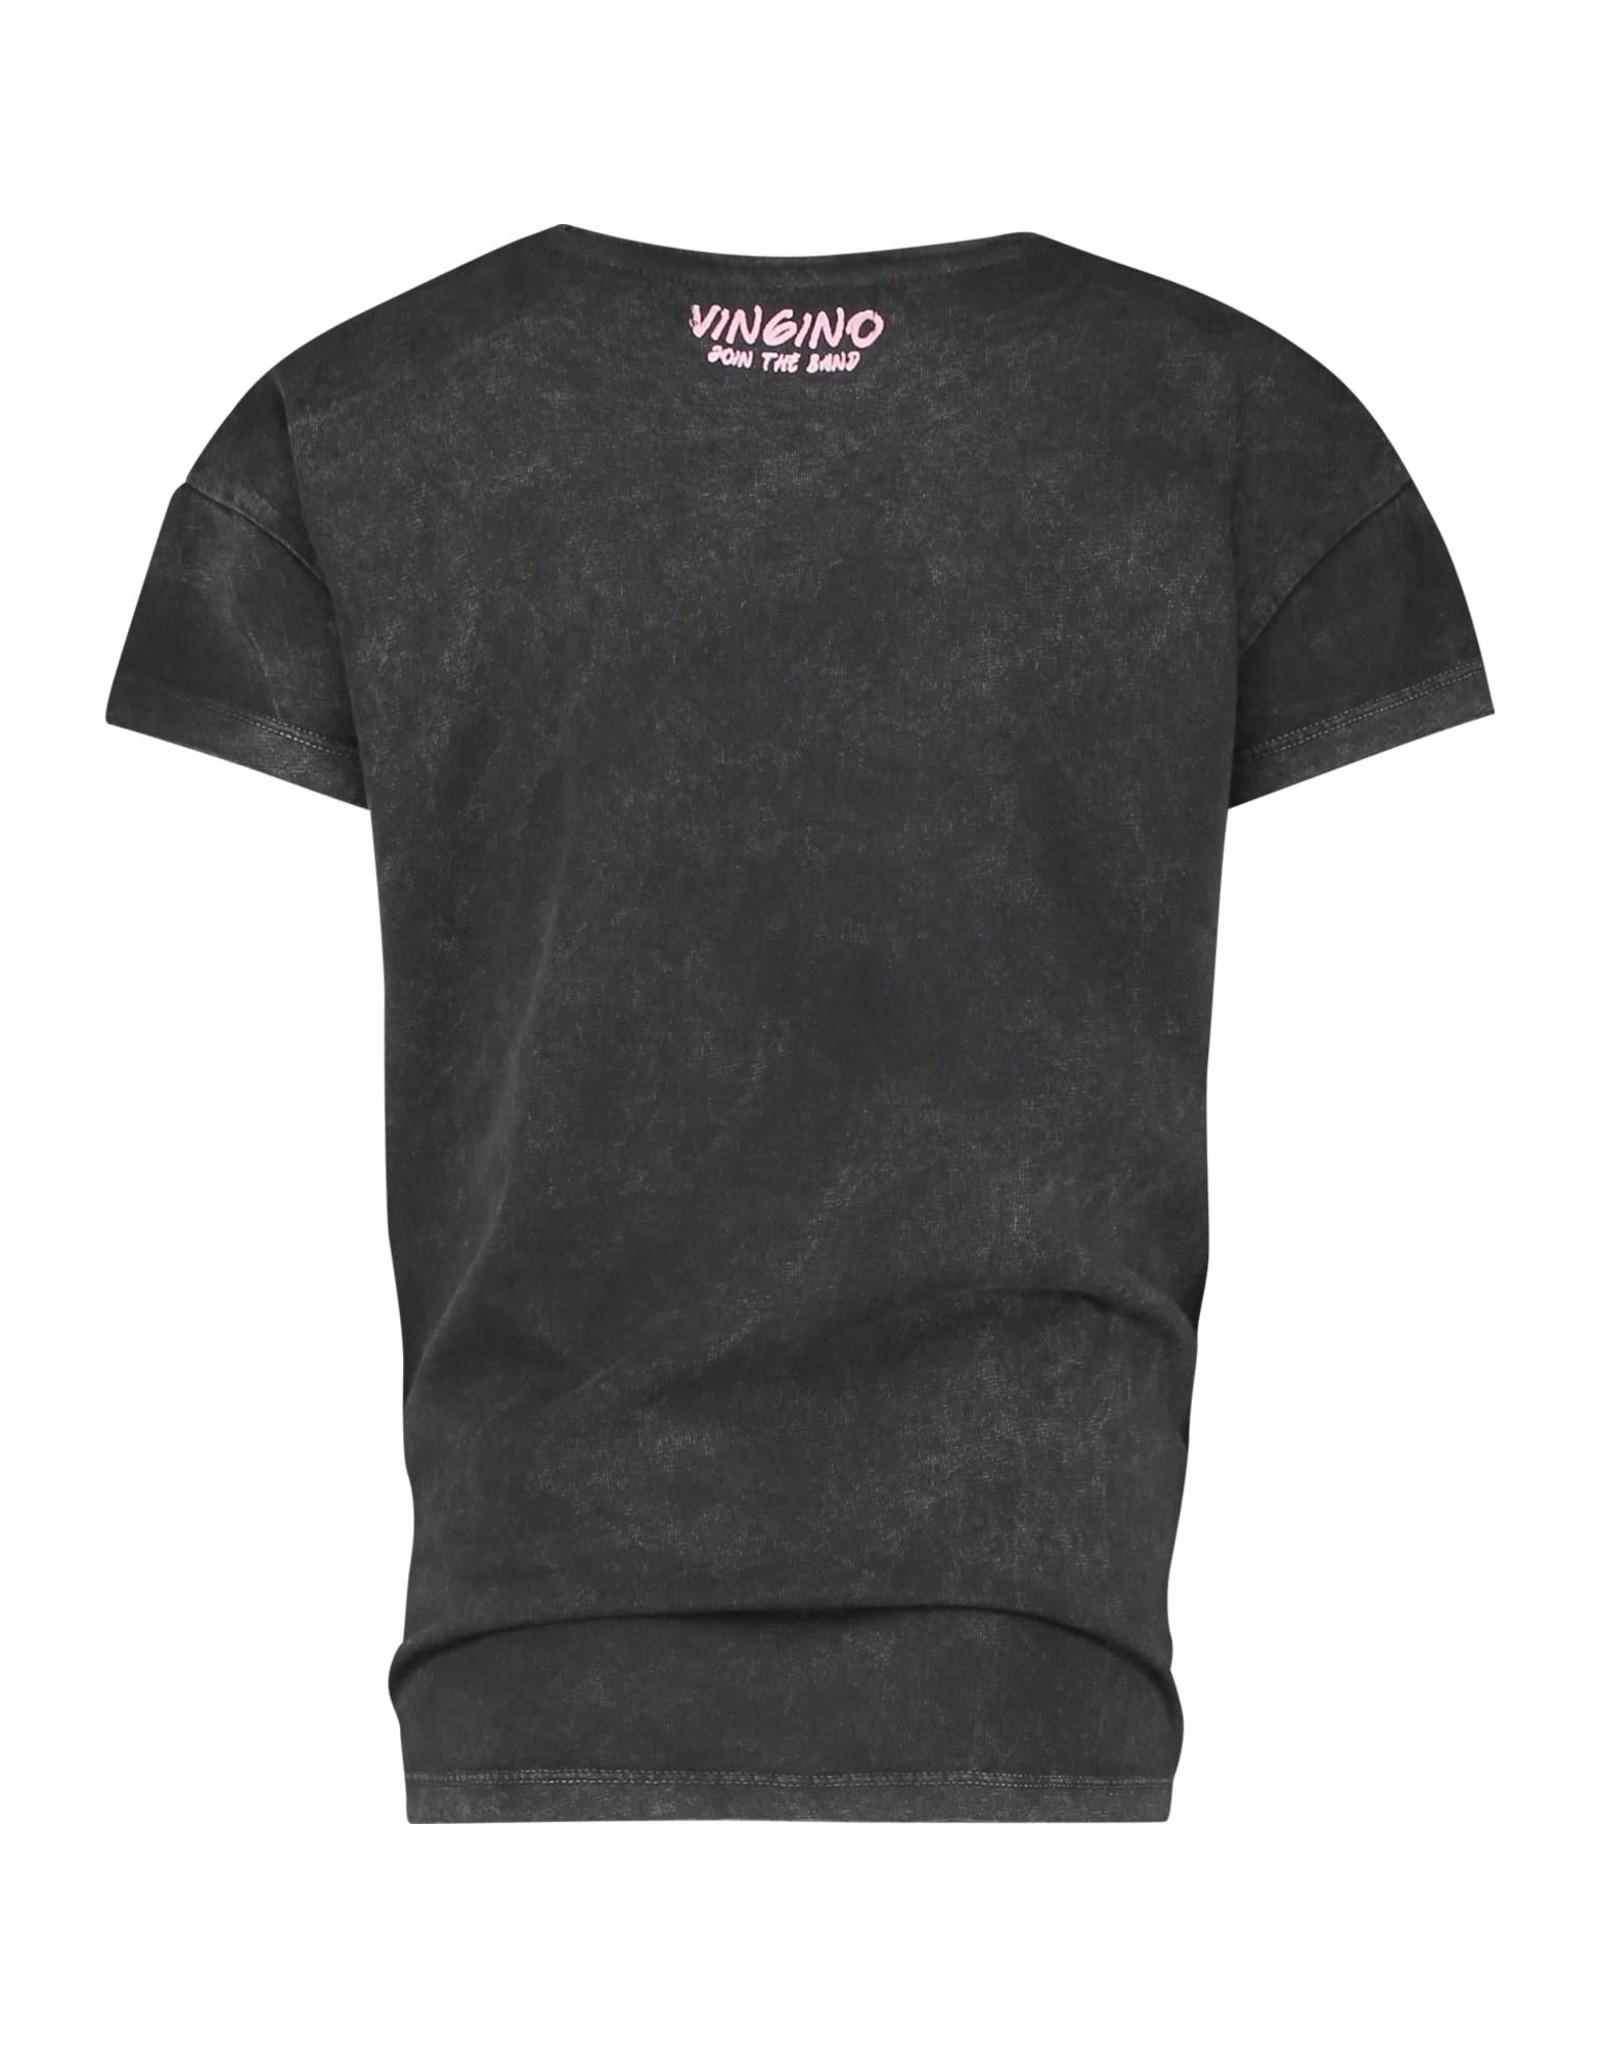 Vingino Vingino meiden t-shirt Hedika Deep Black